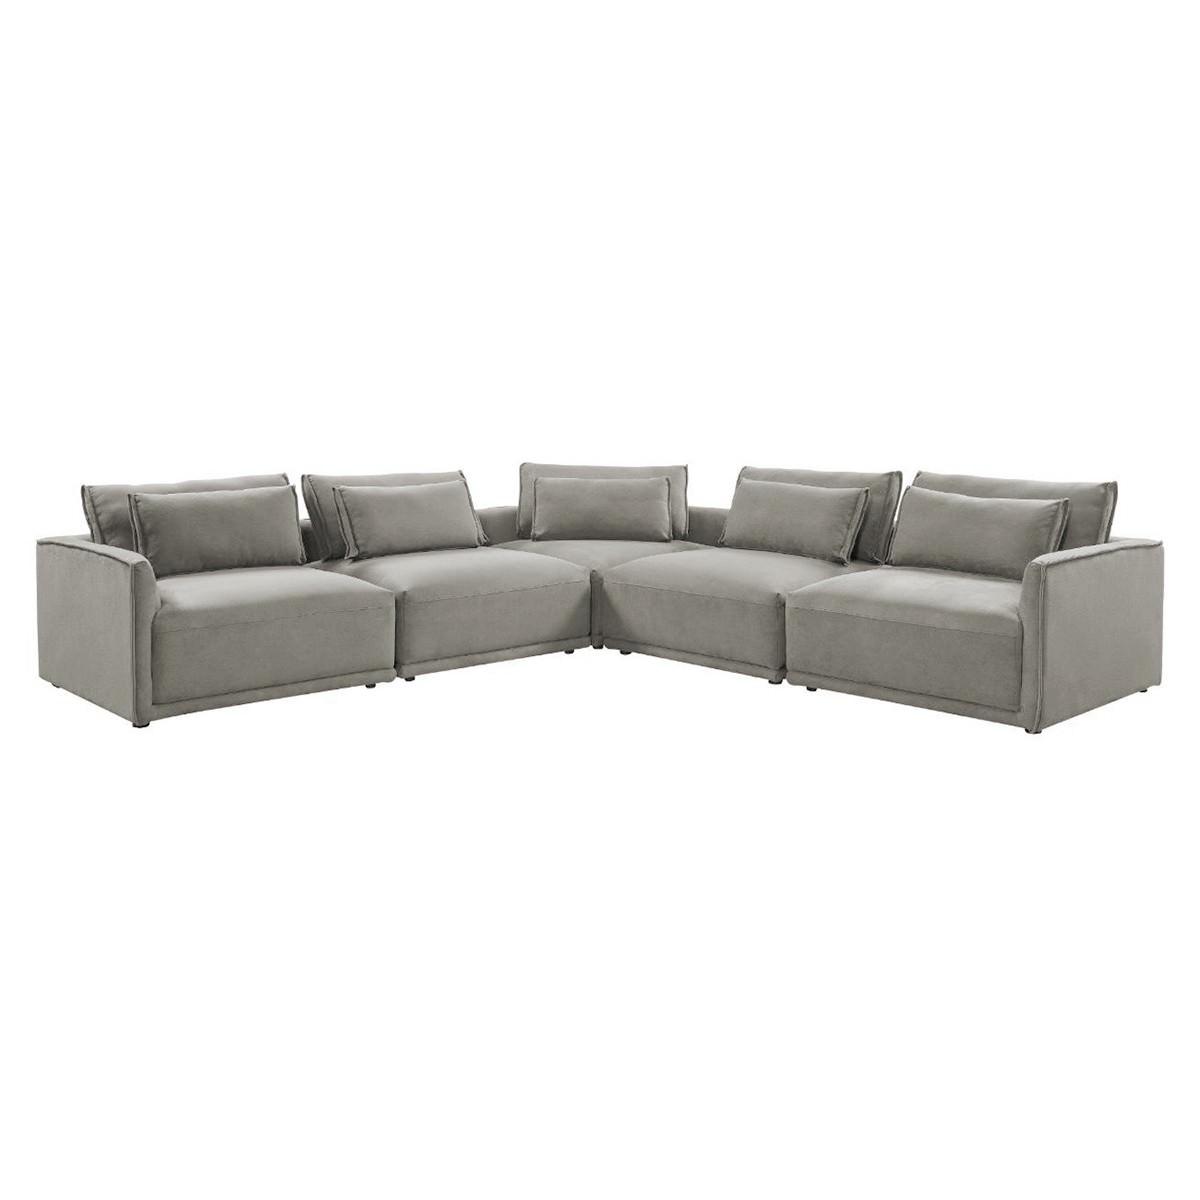 Prince Fabric Modular Corner Sofa, Elephant Grey